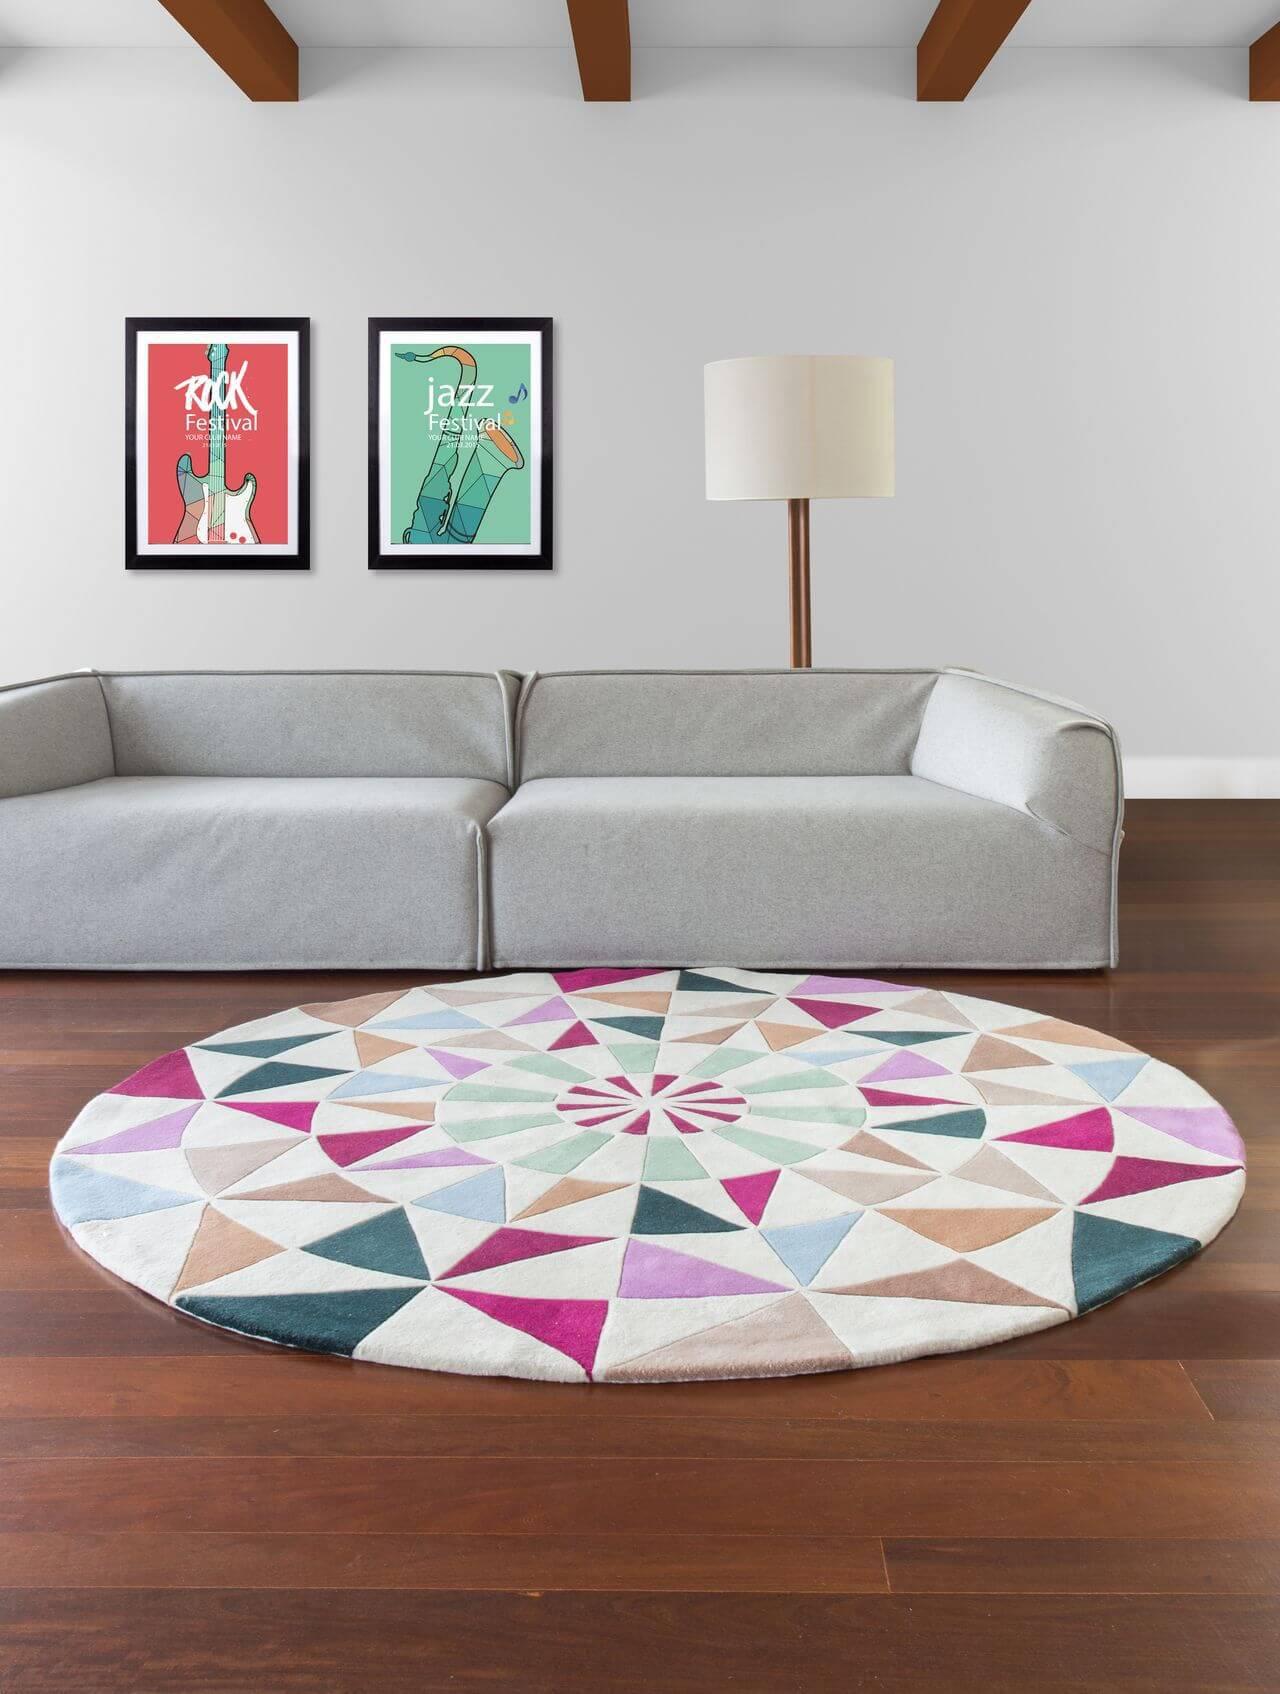 Tapetes para sala redondo em ambiente minimalista Projeto de By Kami